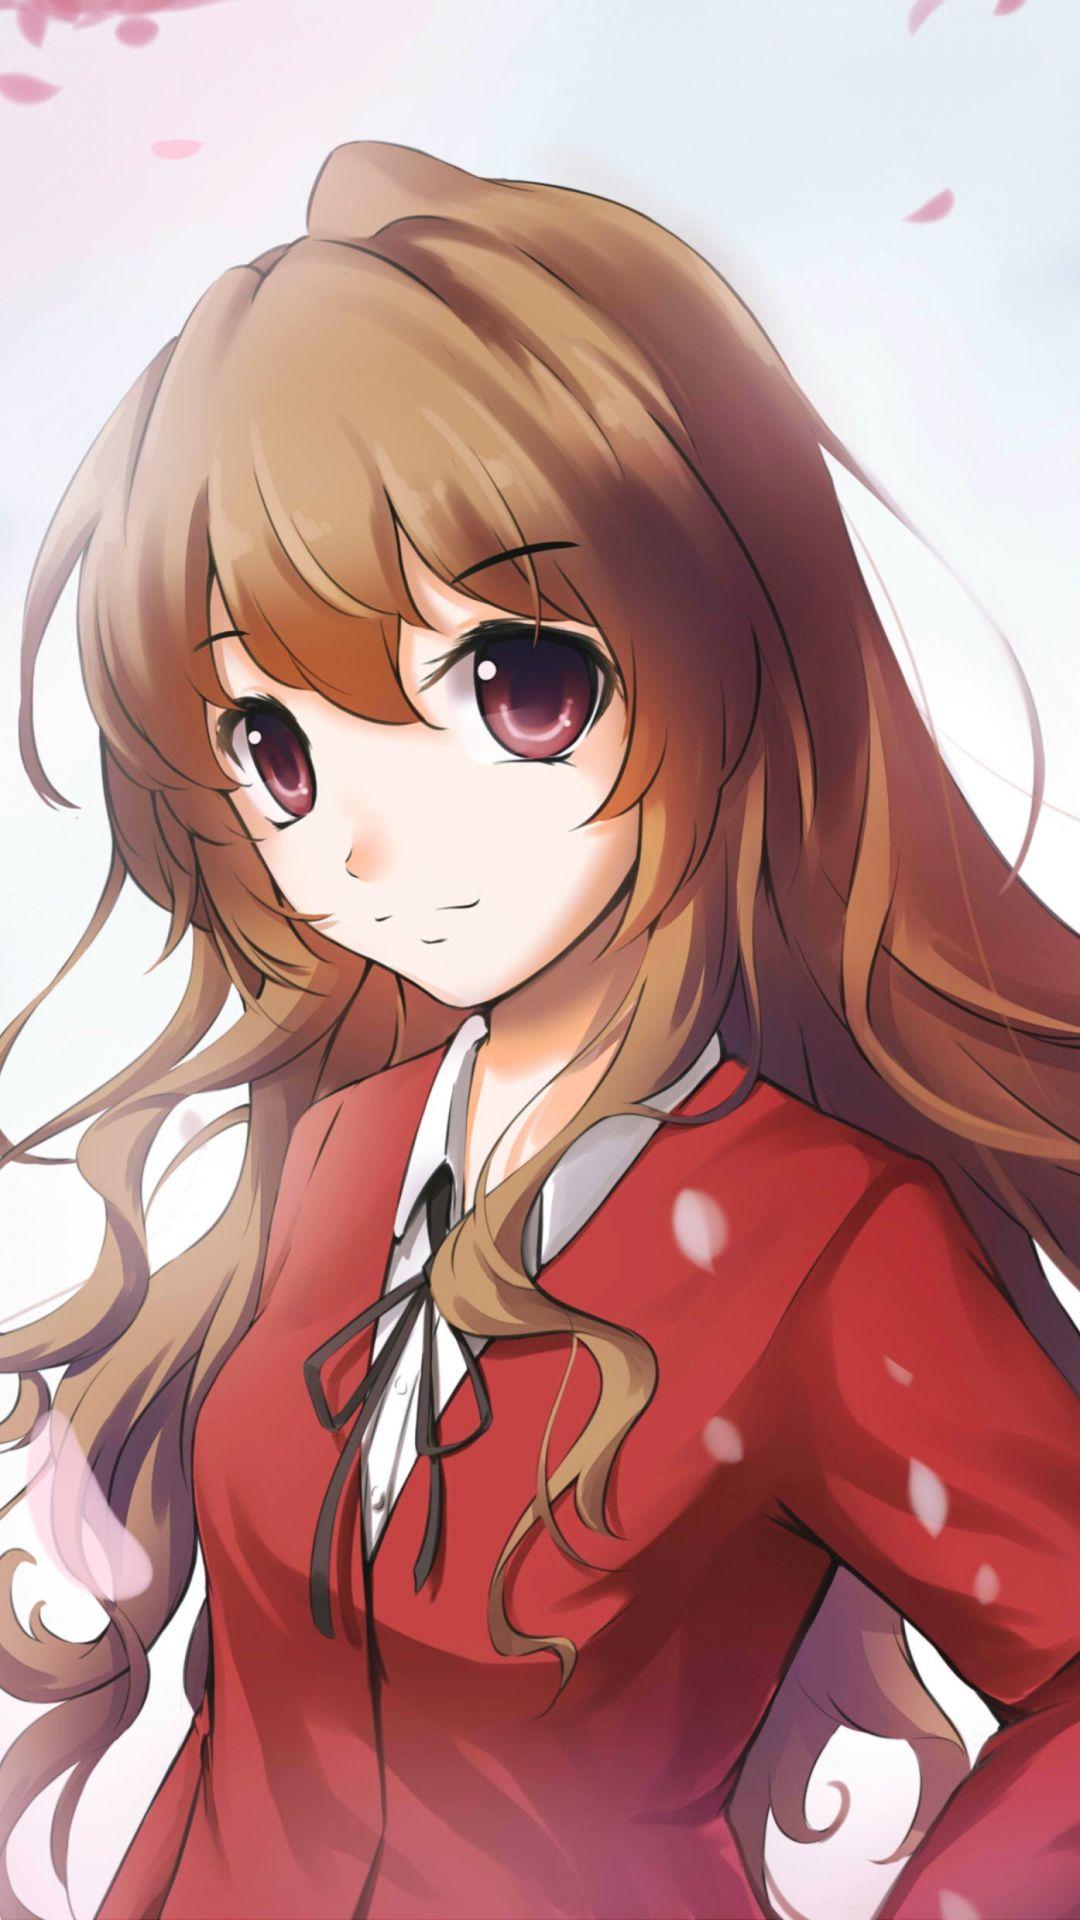 Toradora Taiga Aisaka Girl Anime Art Iphone 6 Wallpaper Anime Toradora Anime Art